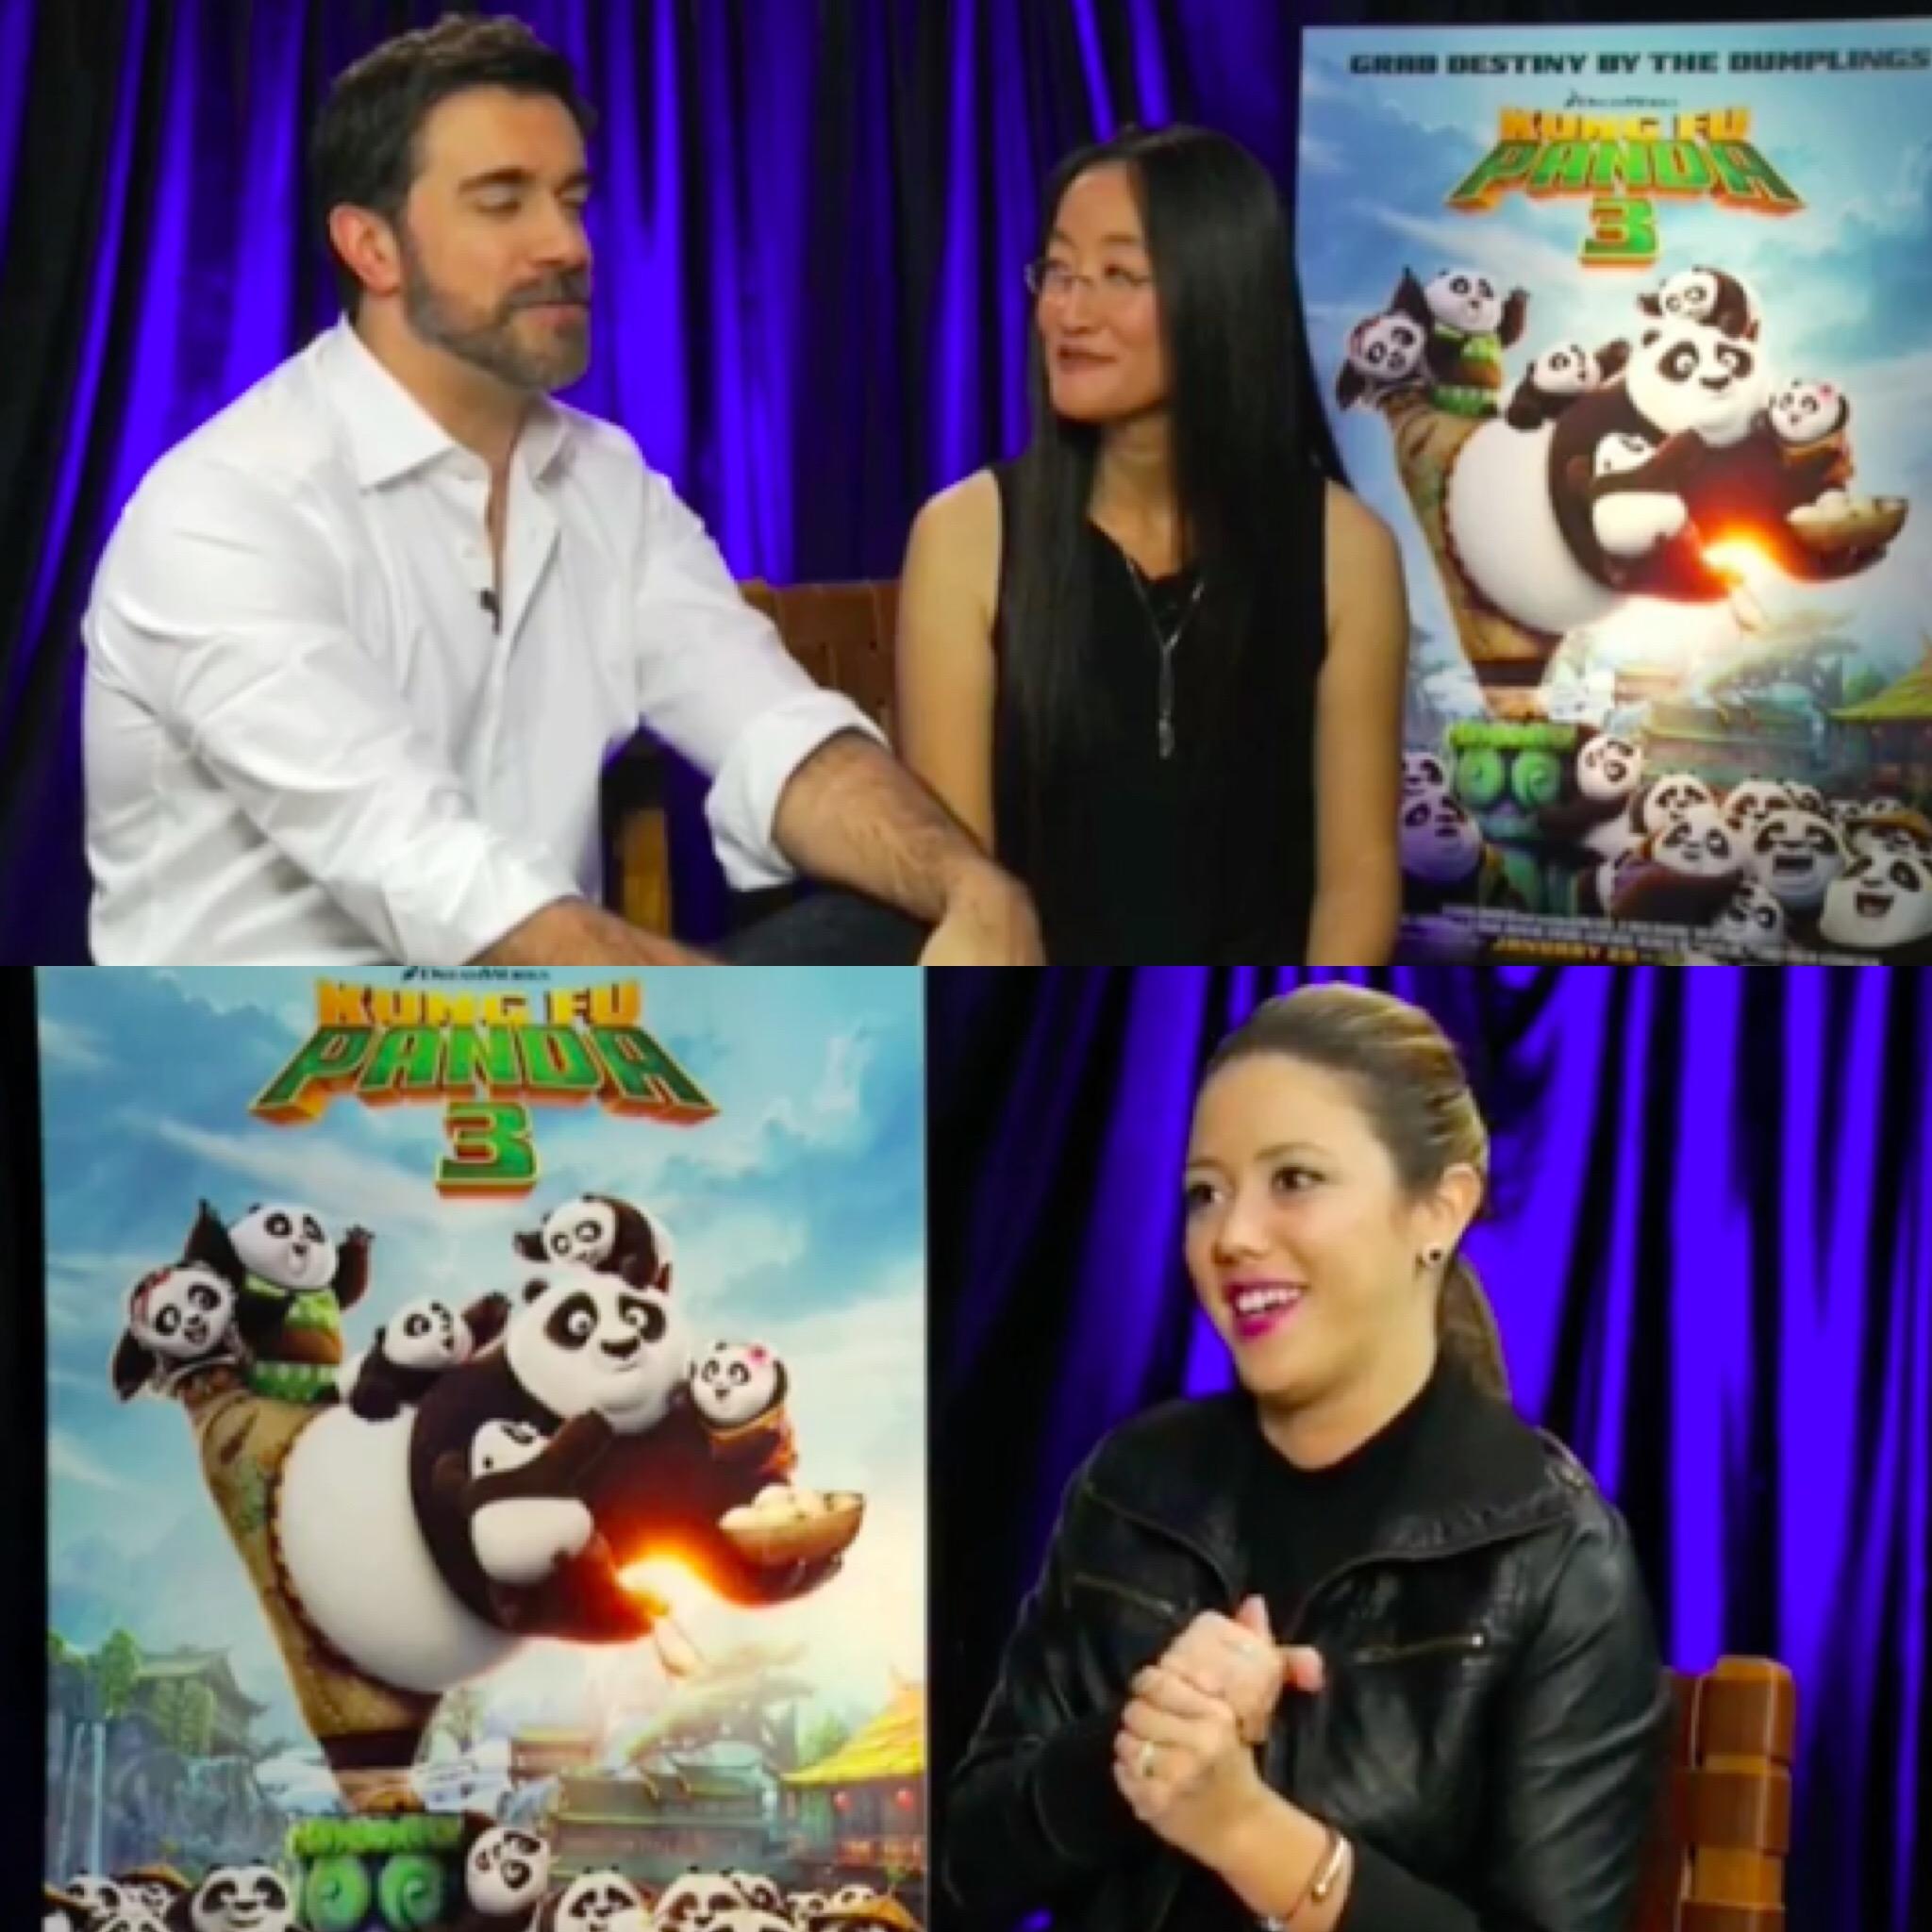 Meli Chats with Animators from Kung Fu Panda 3